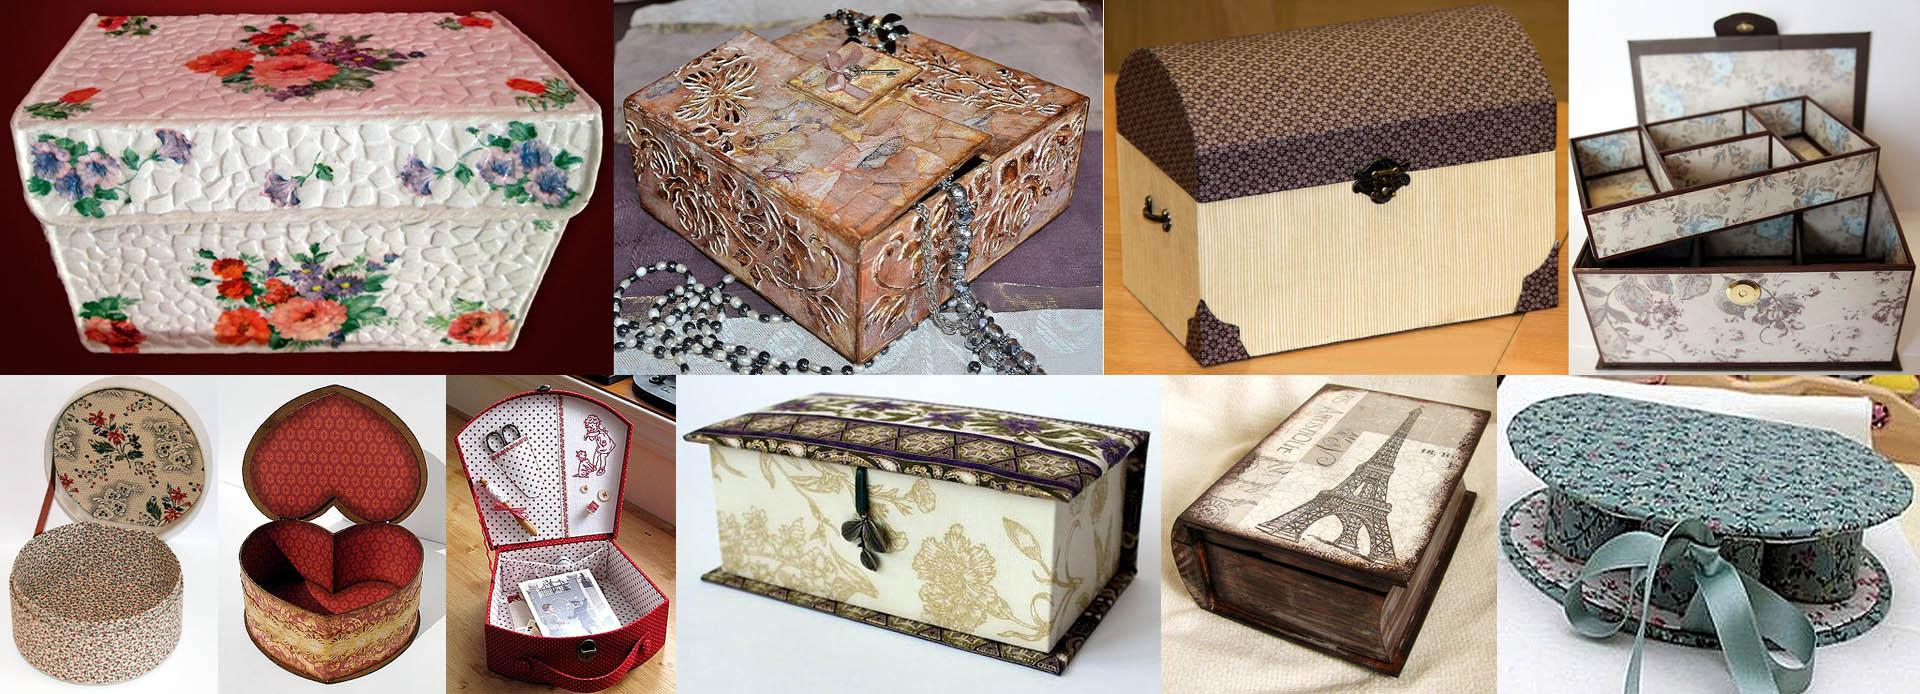 Образцы шкатулок из картона